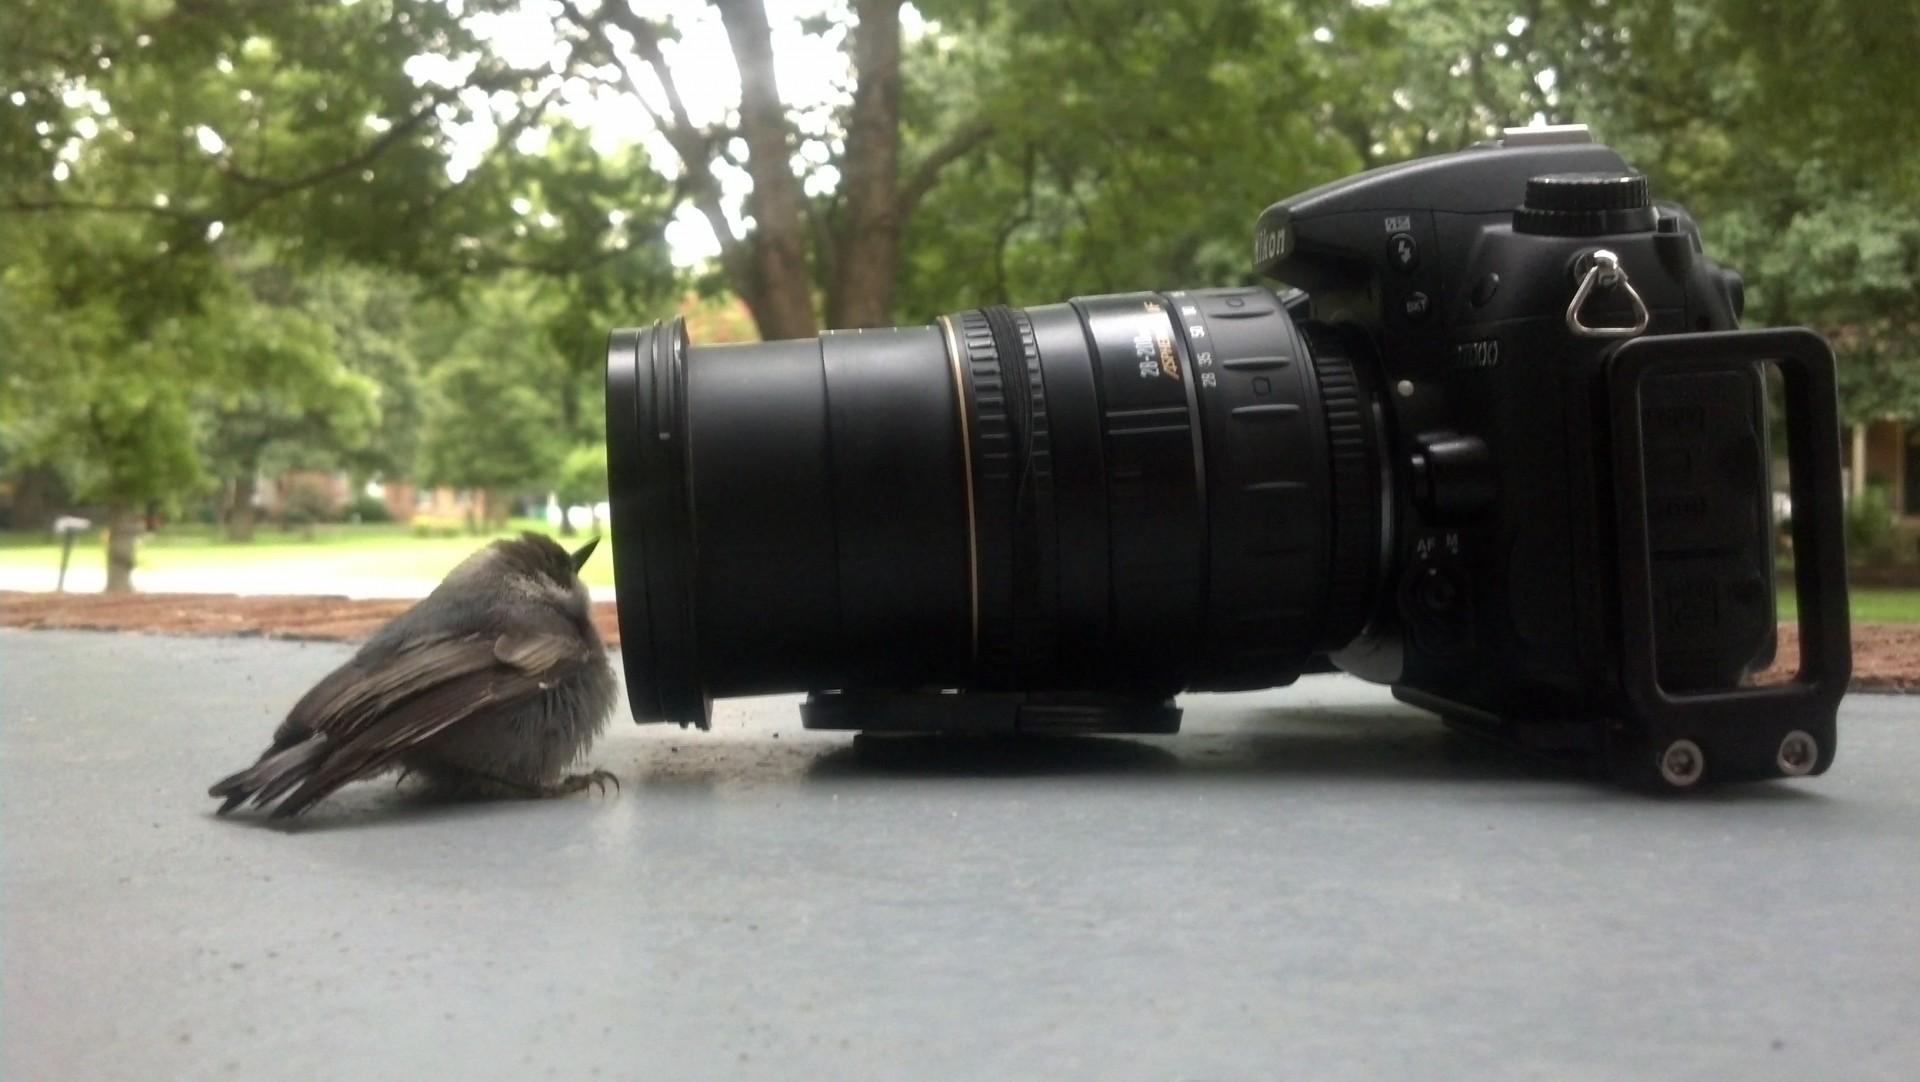 Bird Watching, Camera